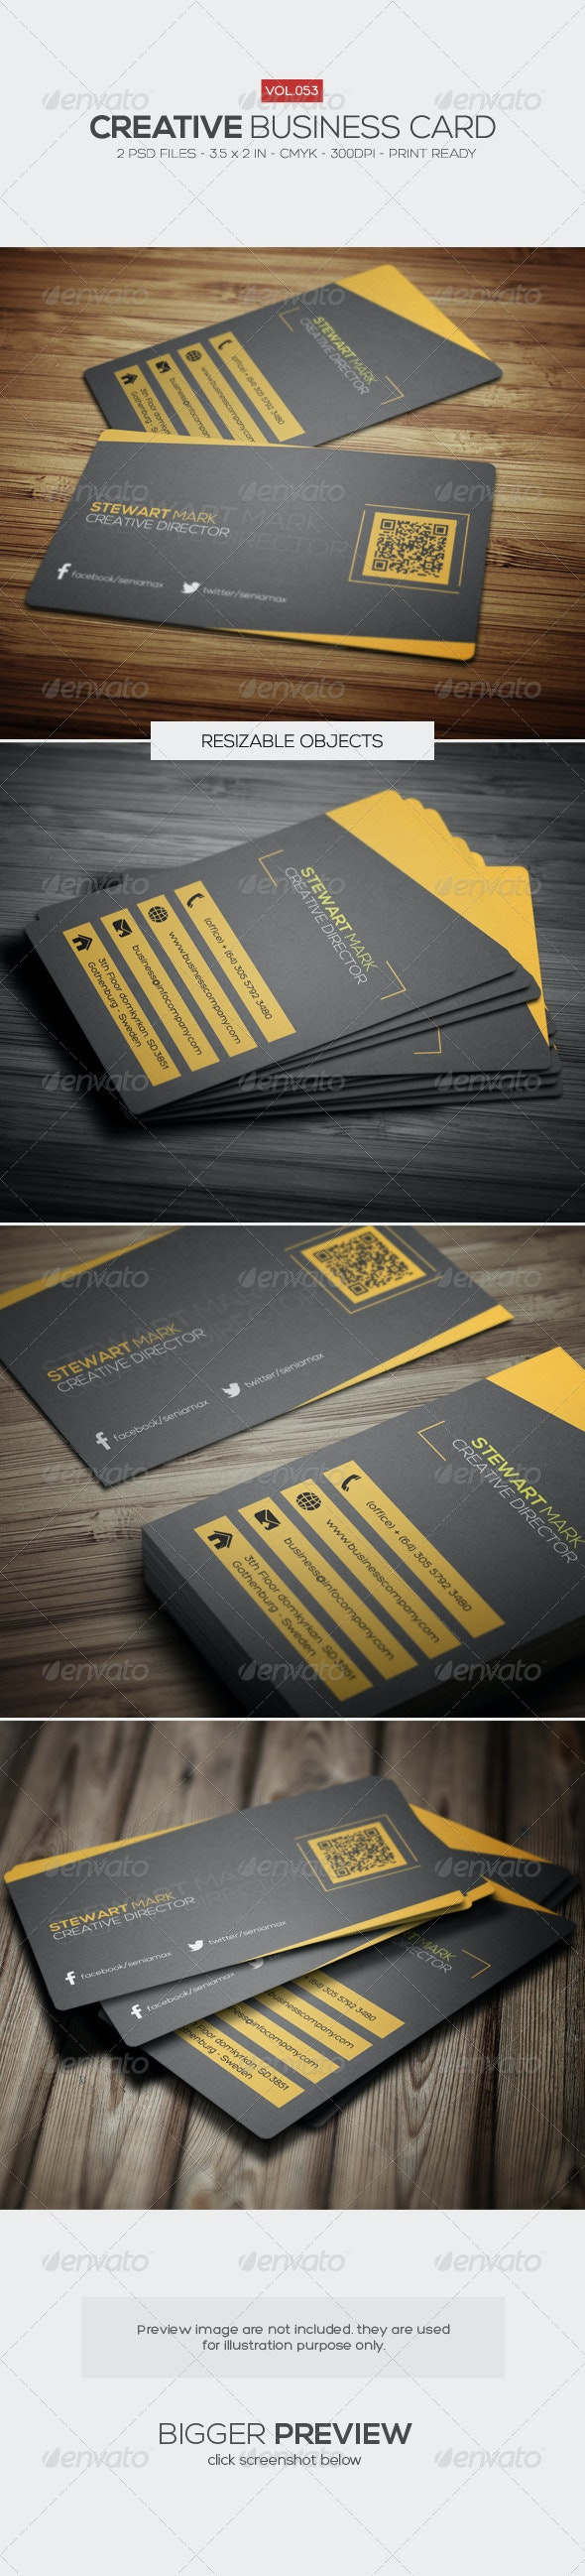 Creative Business Card 053 - Creative Business Cards